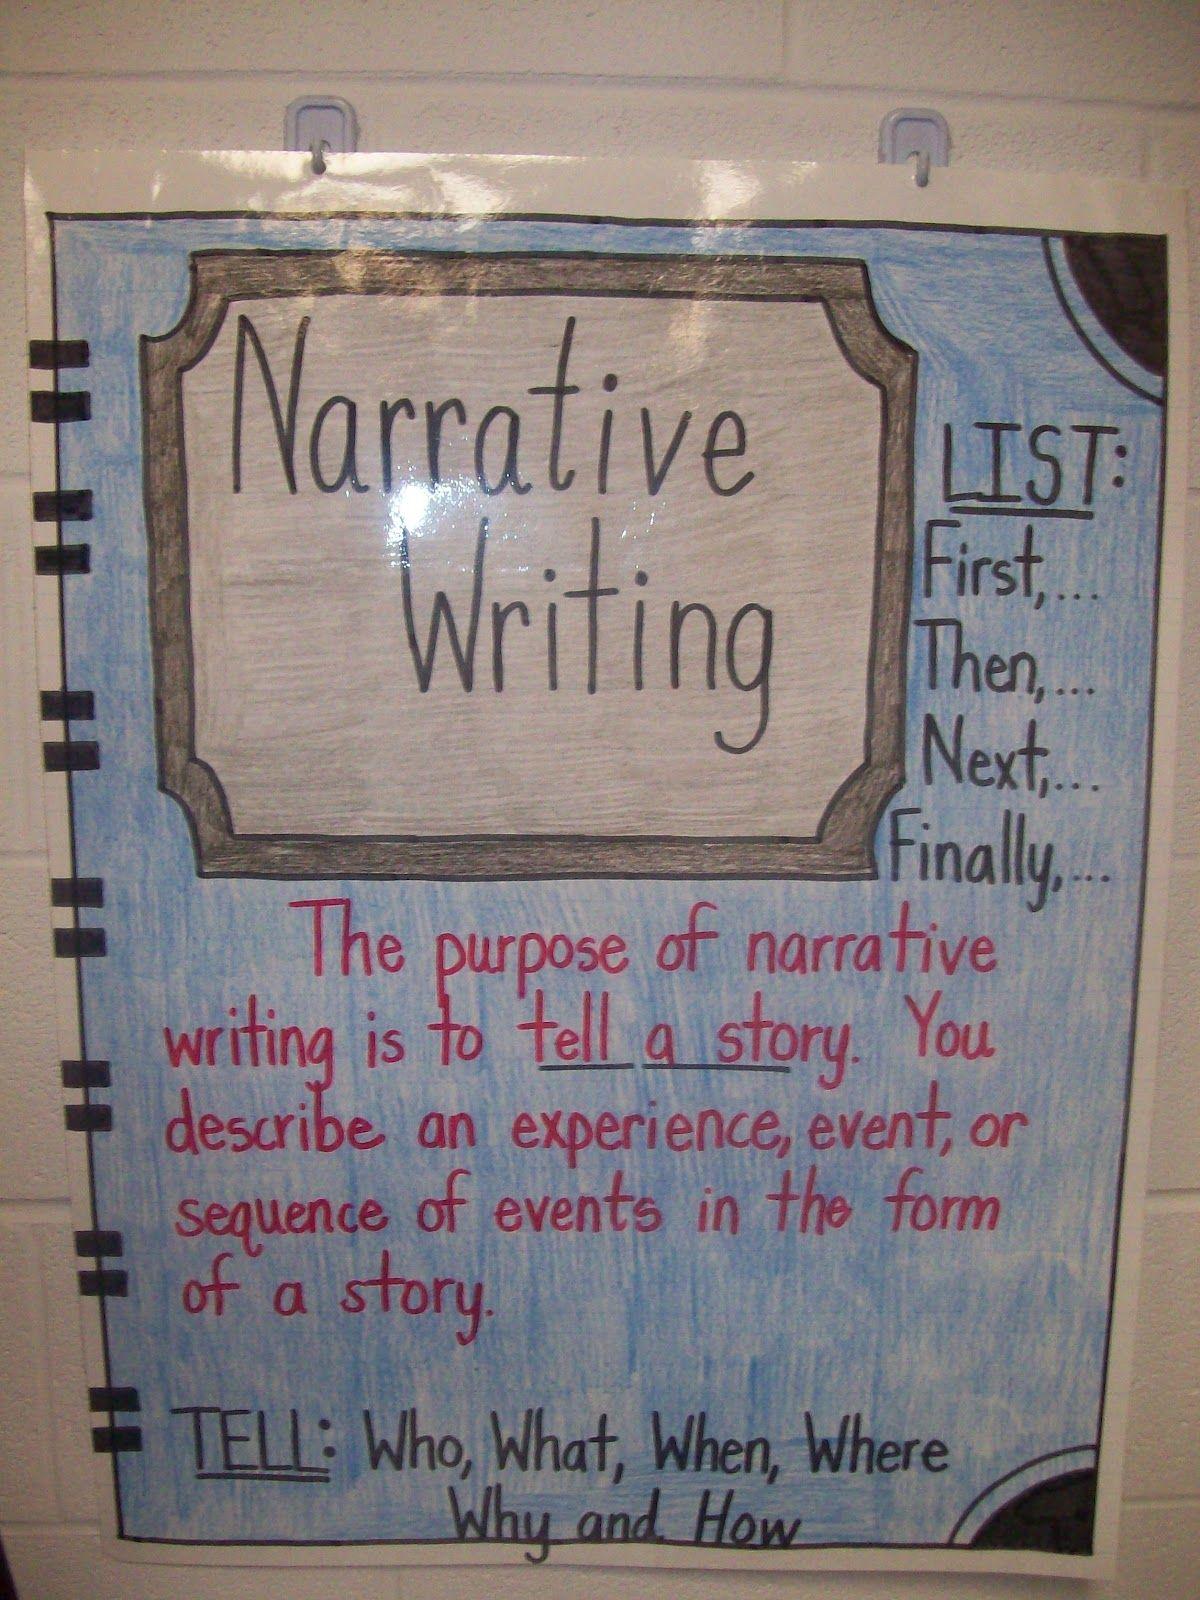 Narrative Writing | School ideas | Writing anchor charts, Narrative